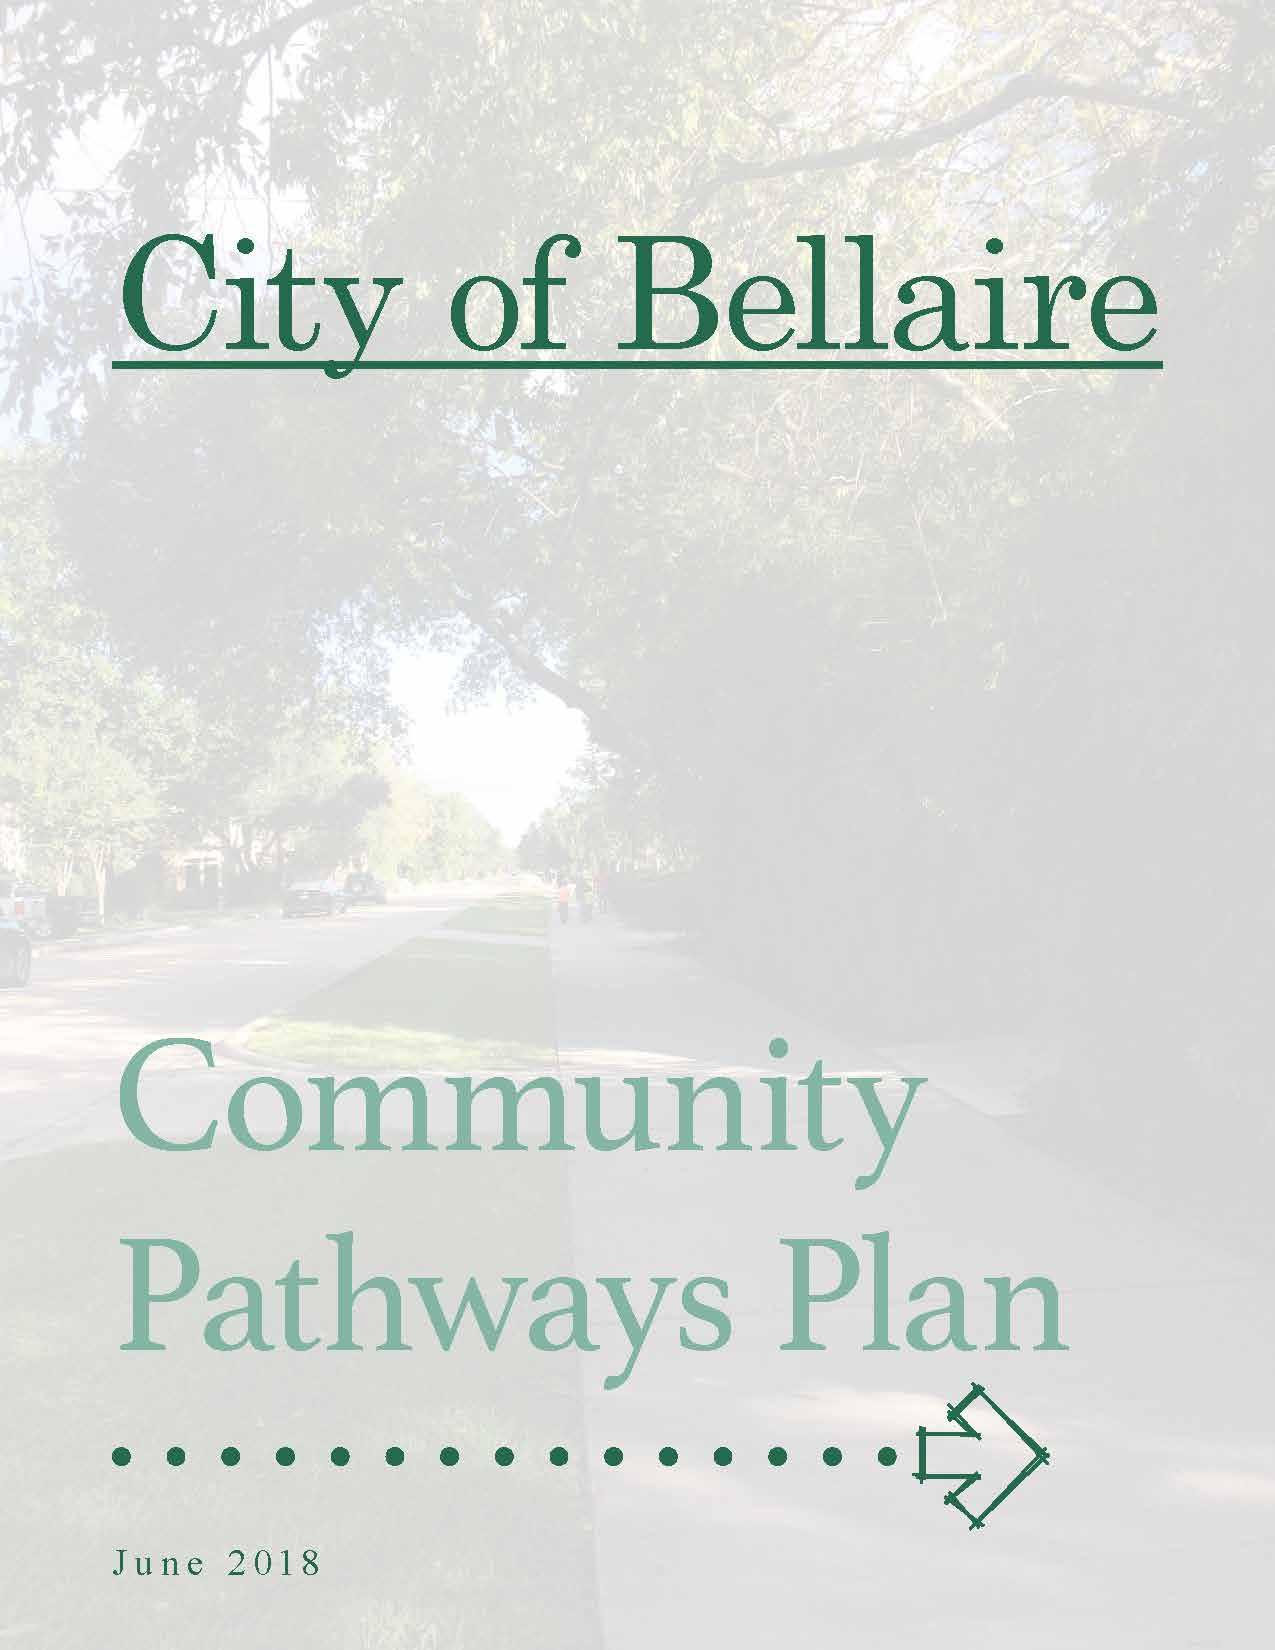 Pathways Plan - June 2018